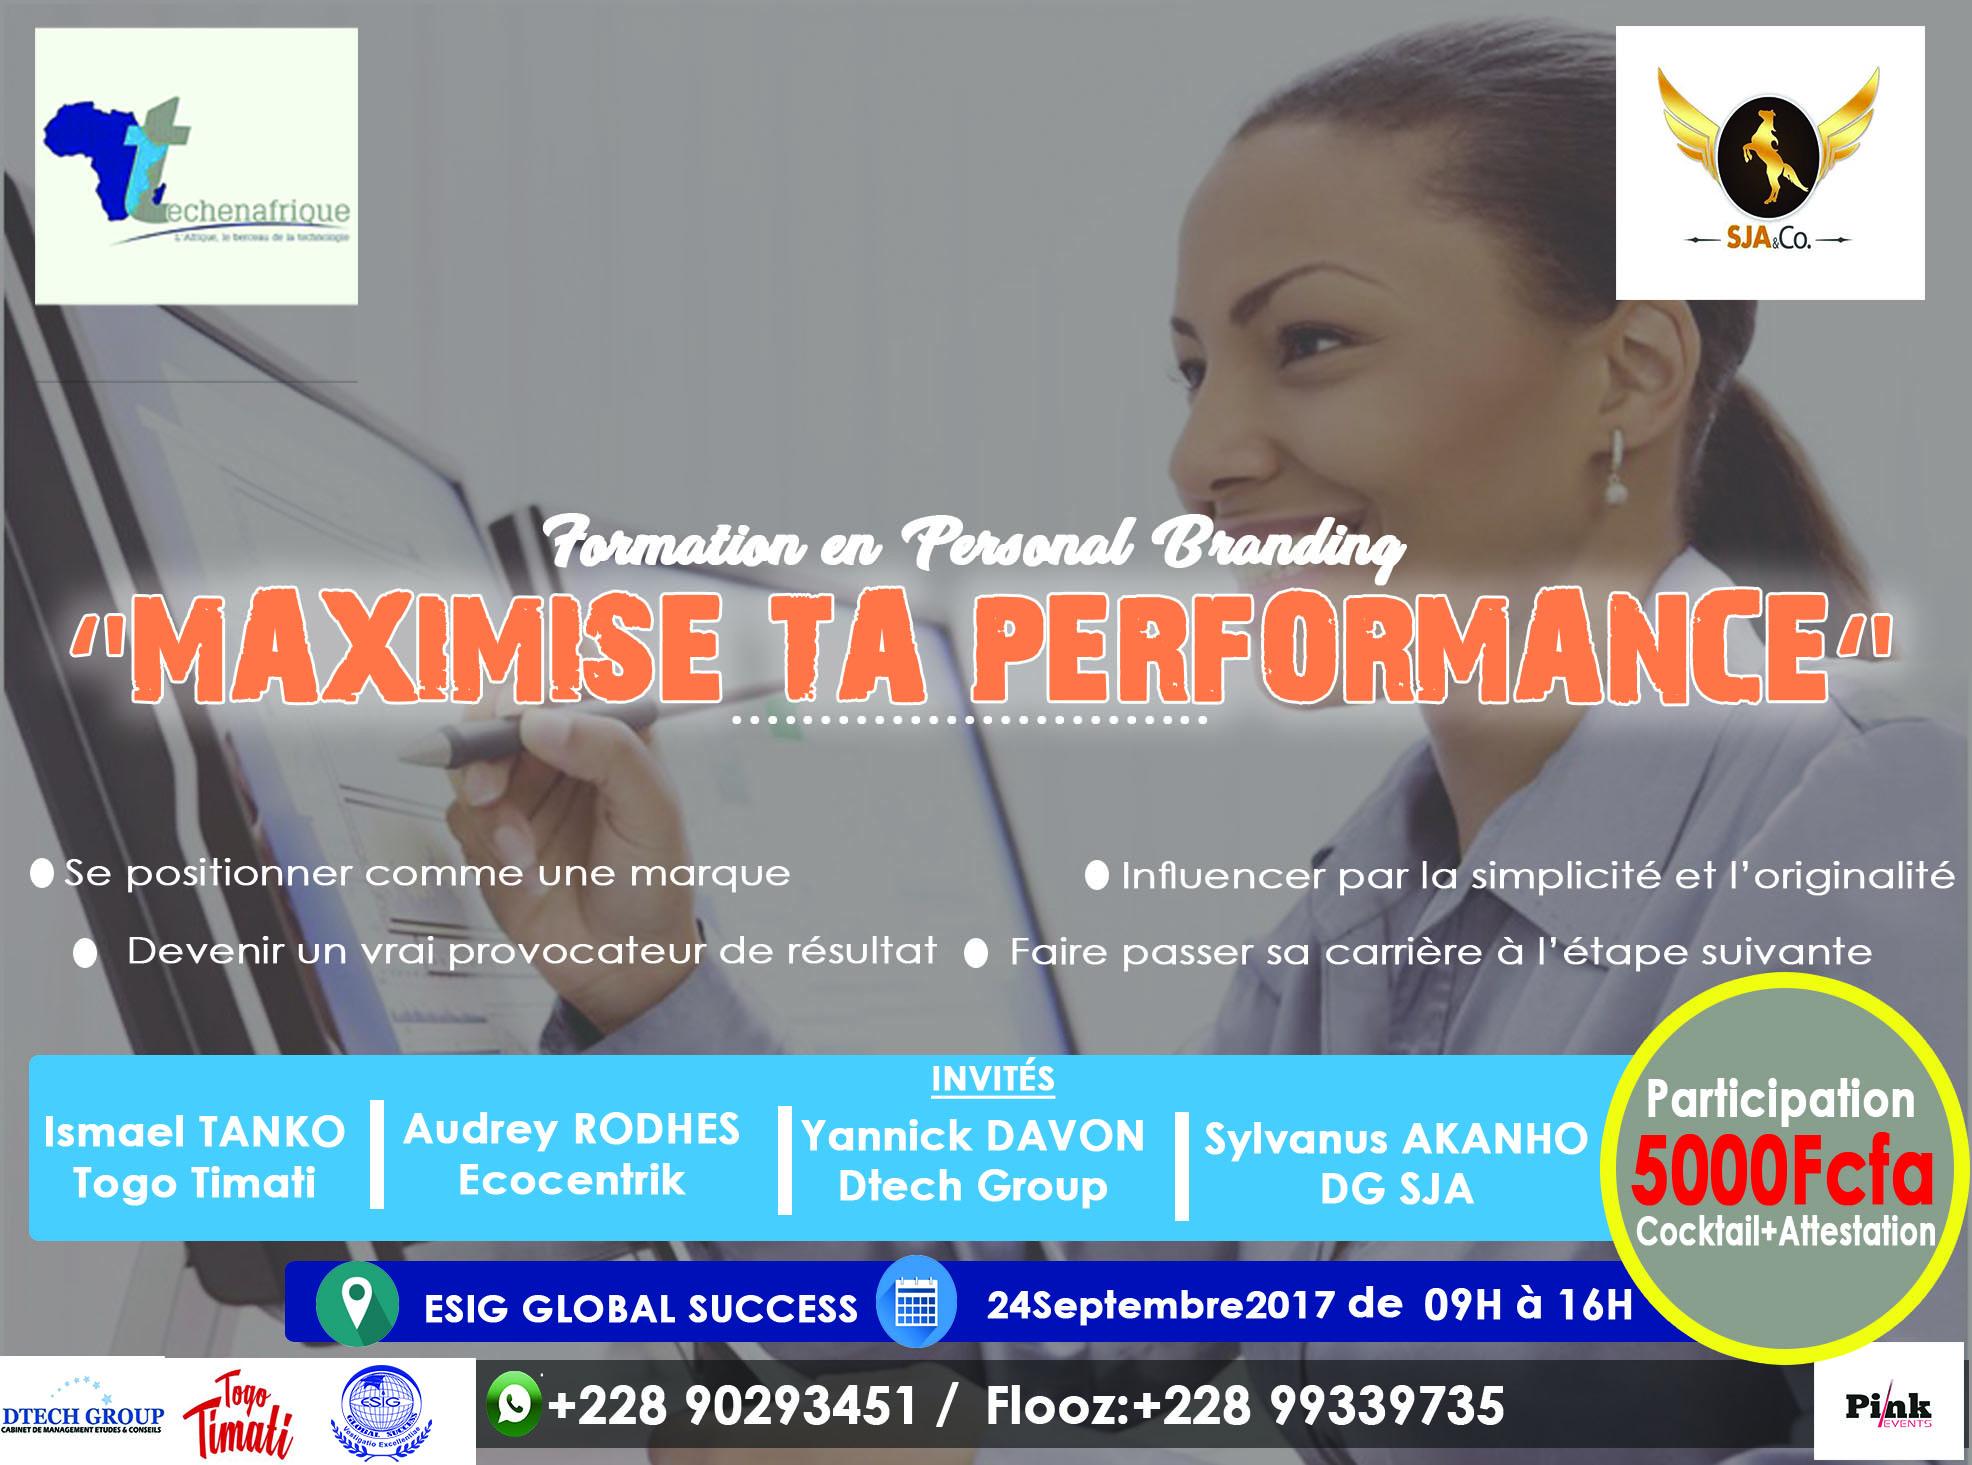 Maximise ta performance